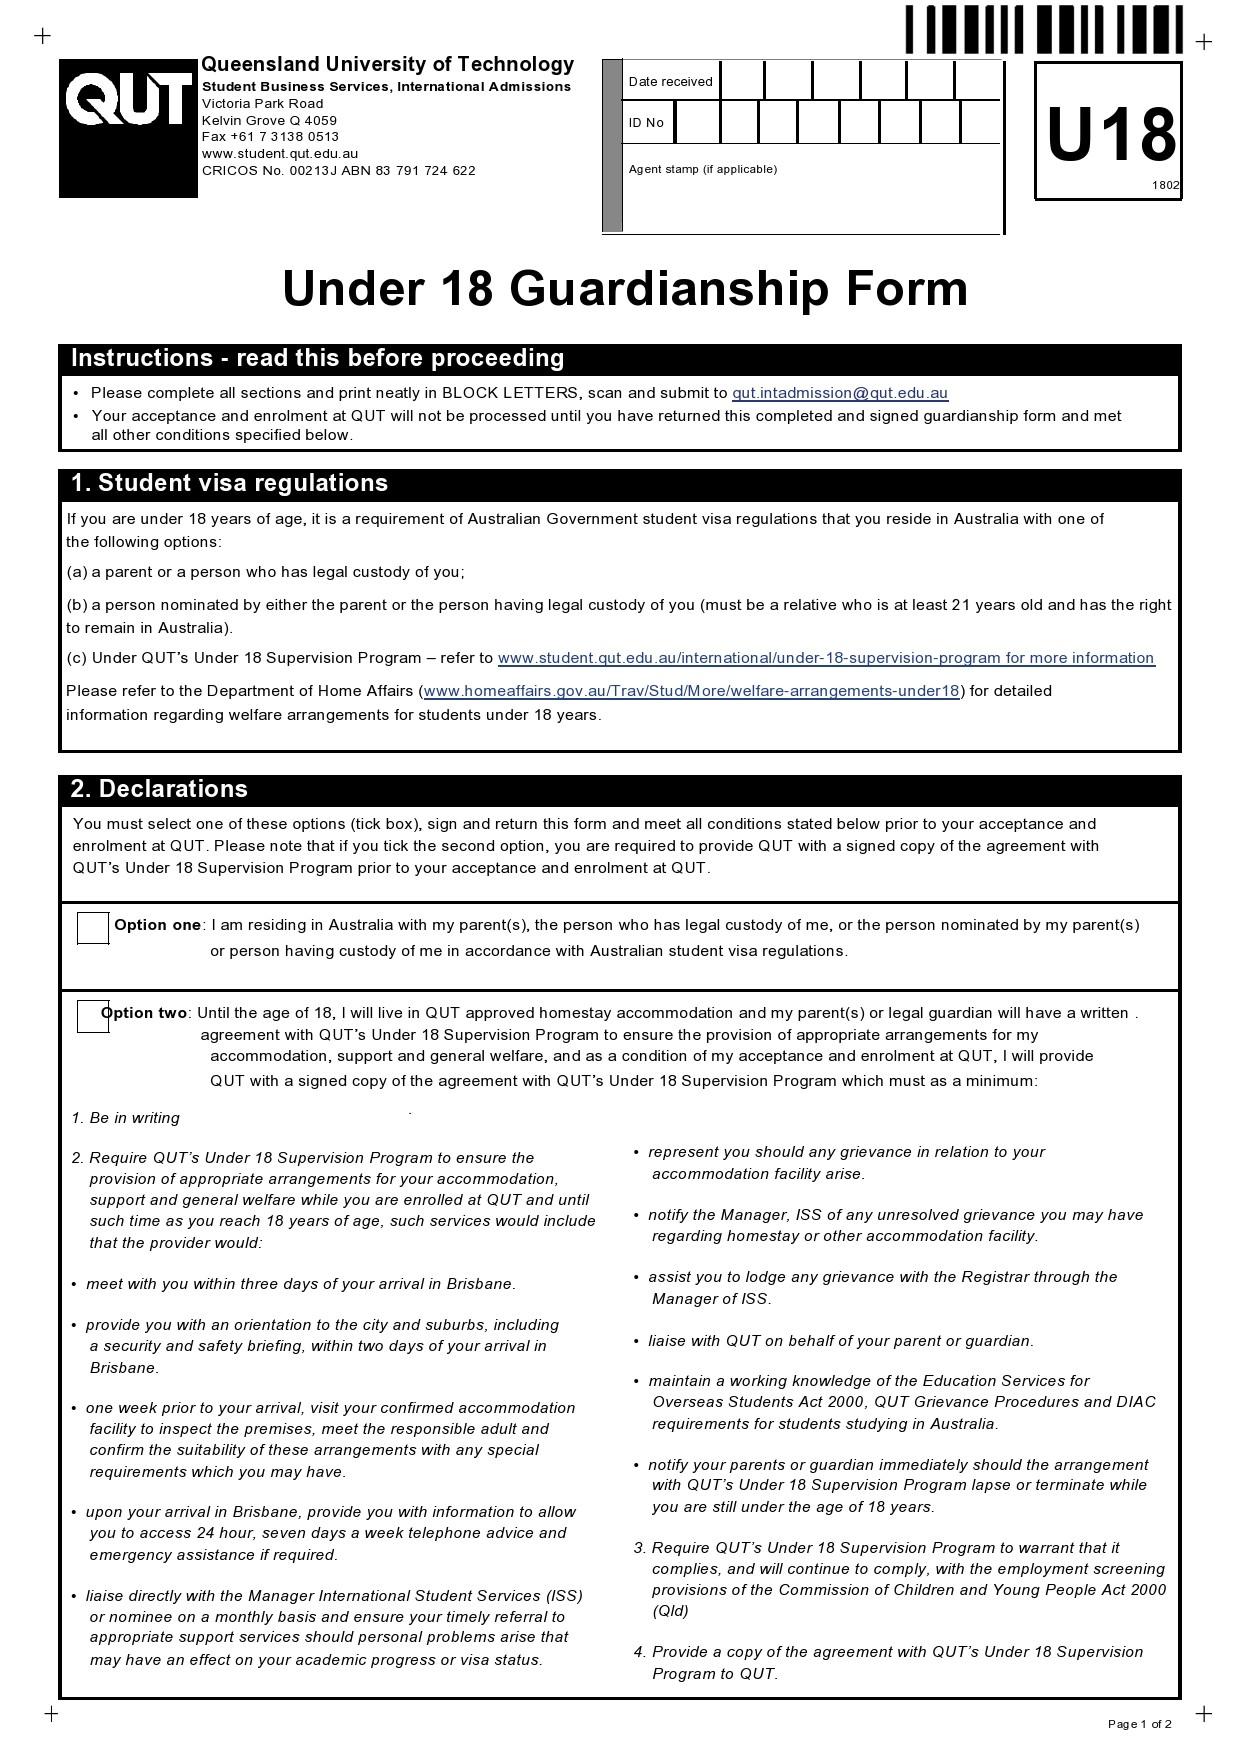 Free guardianship form 33